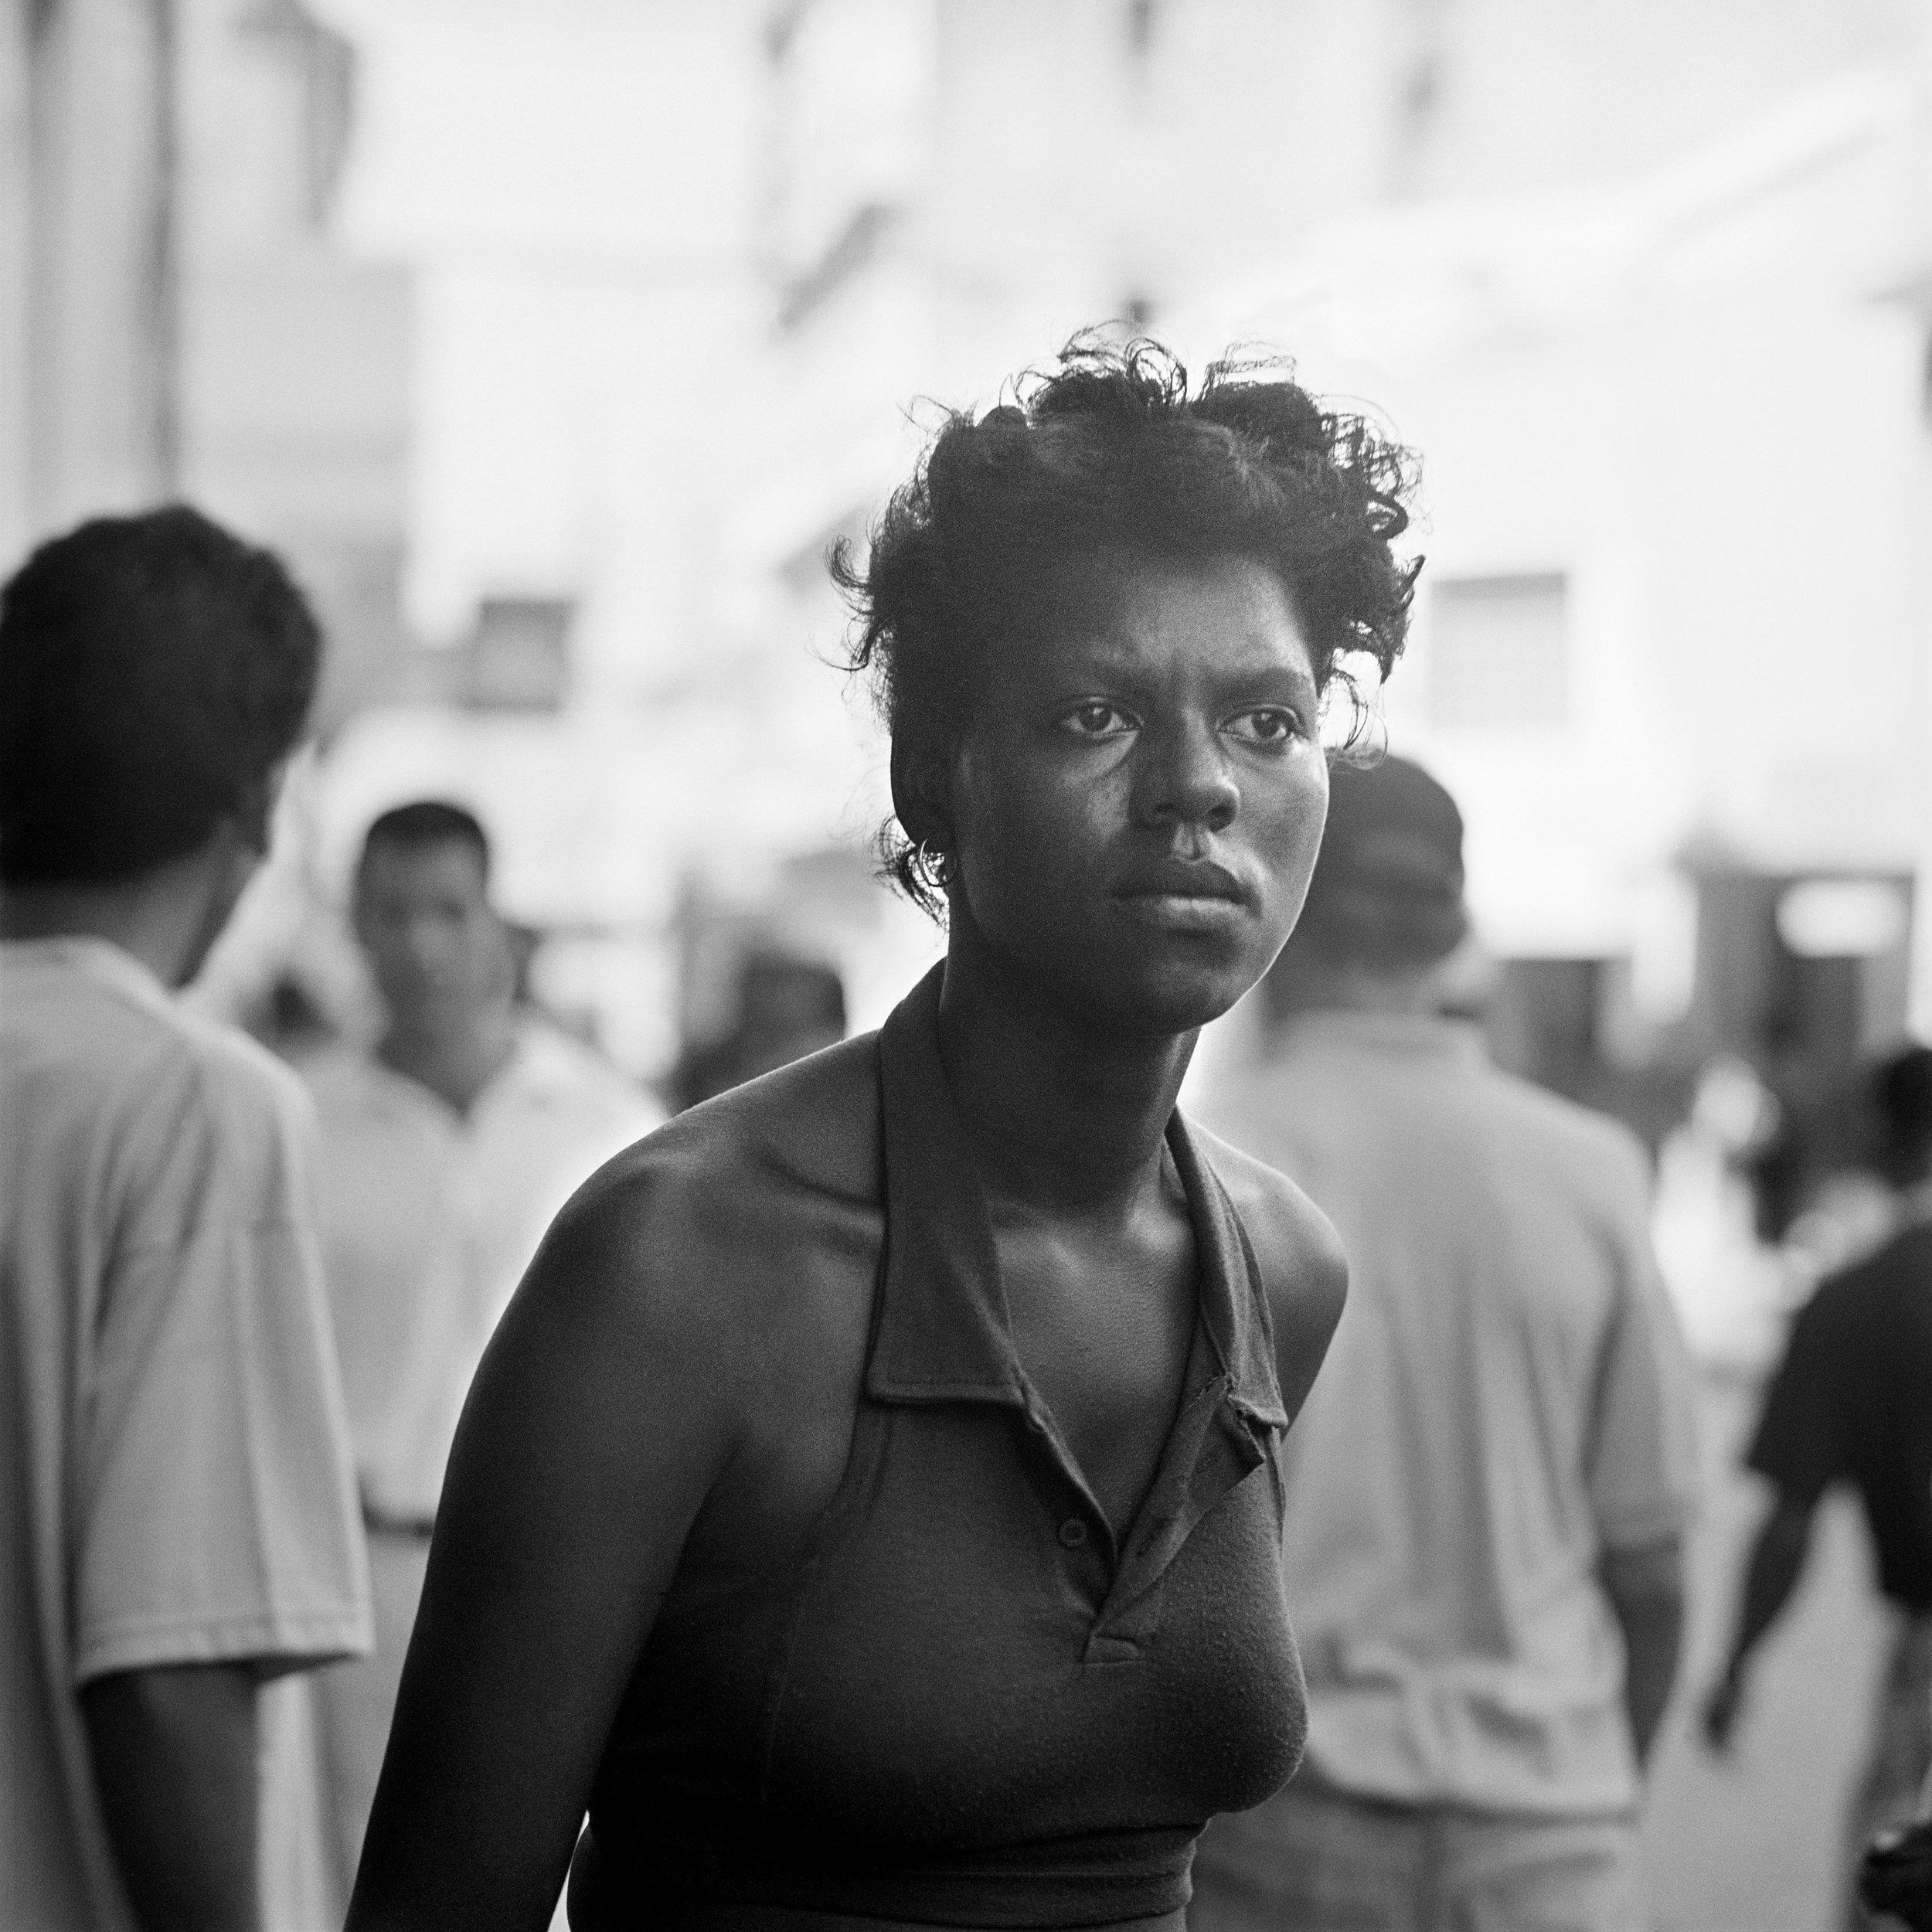 Cuban Stories